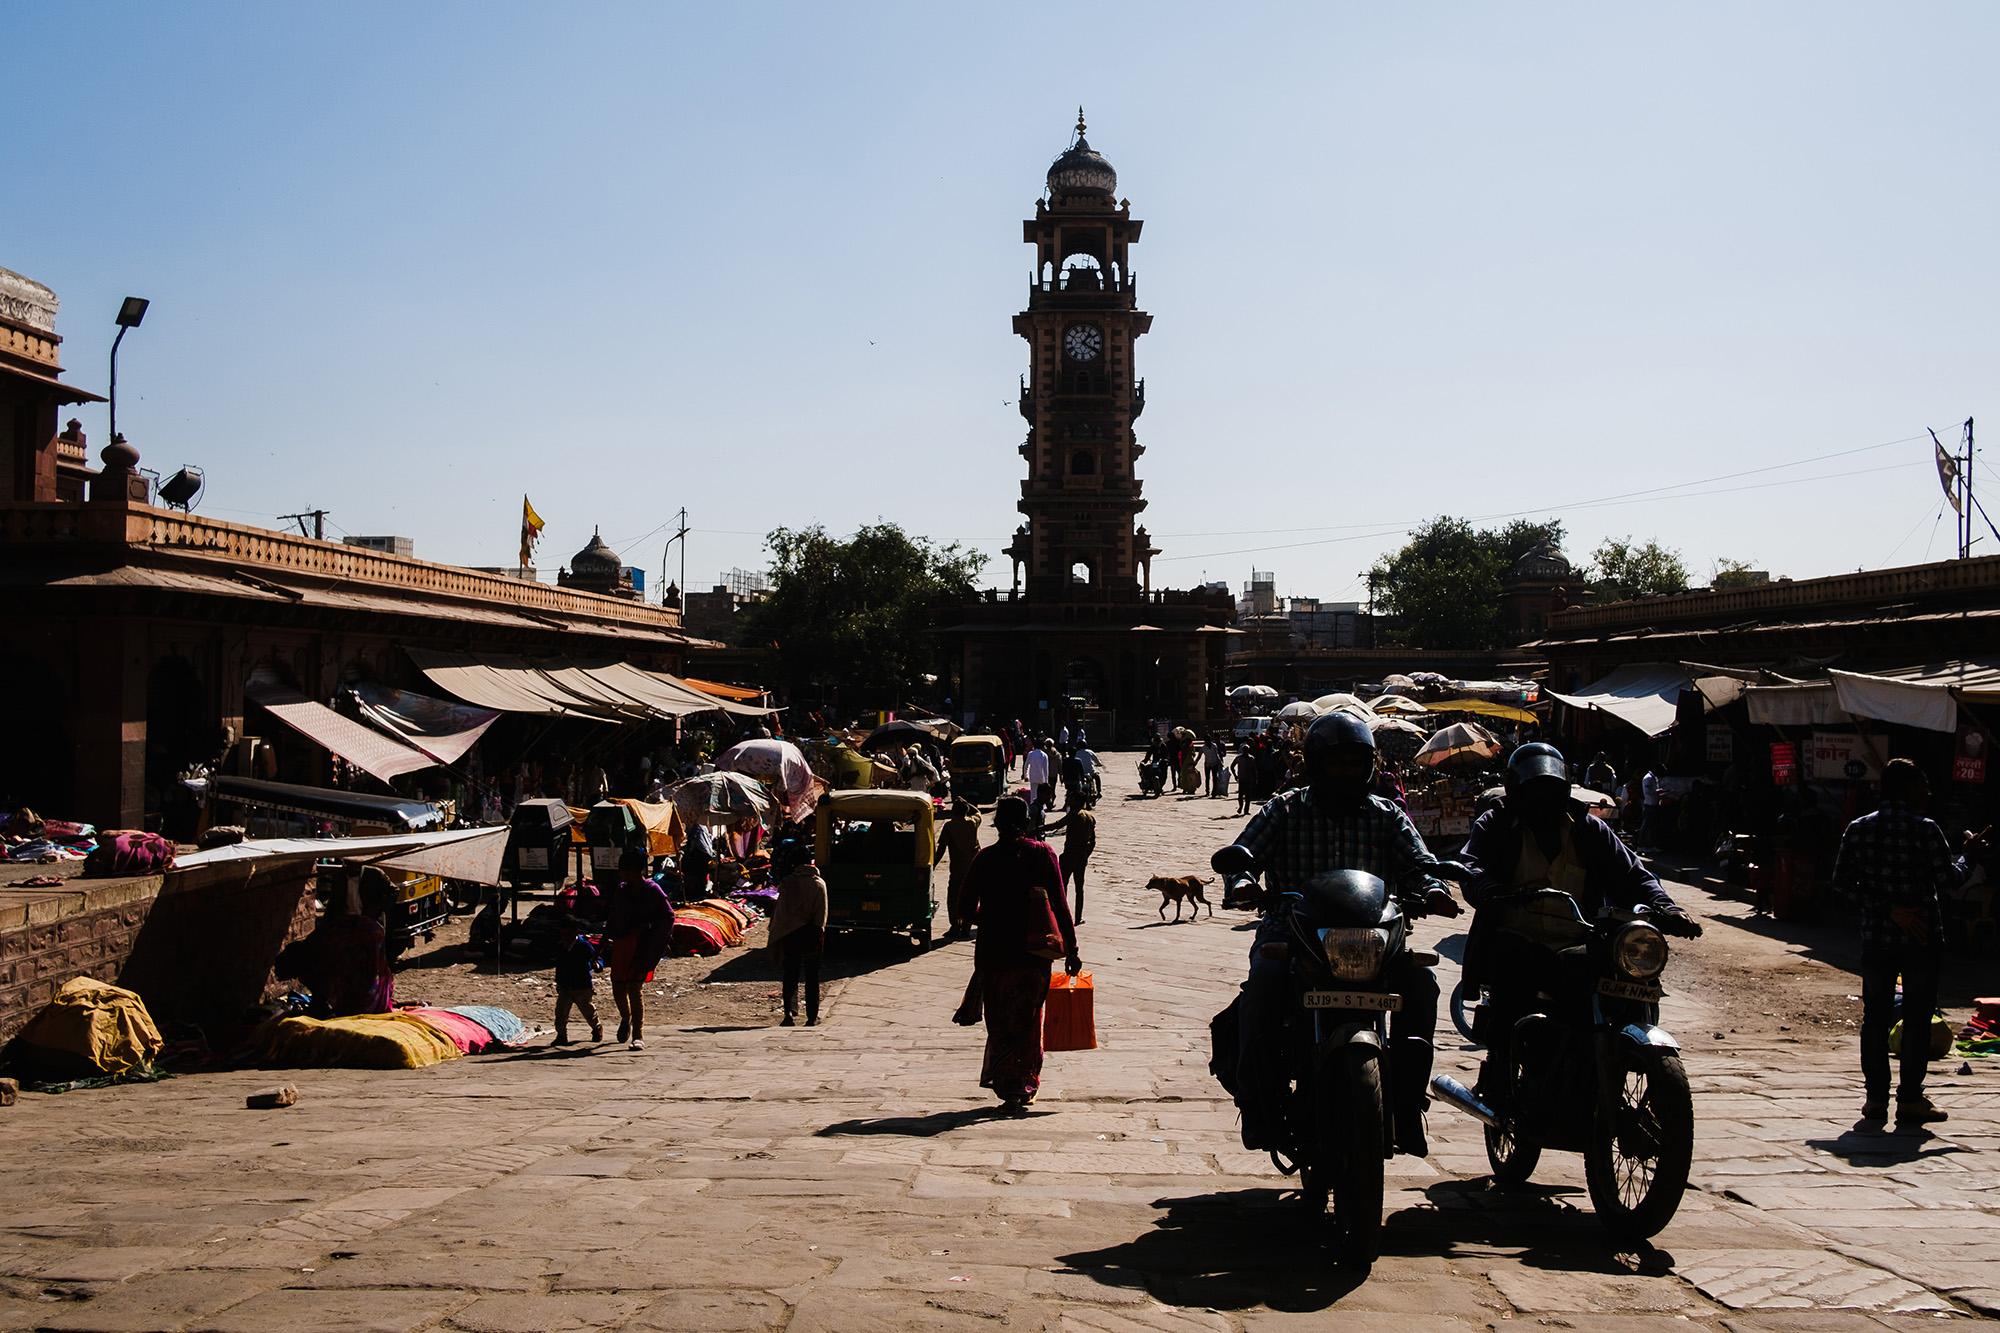 AnjaPoehlmann_India-Jodhpur_040.jpg